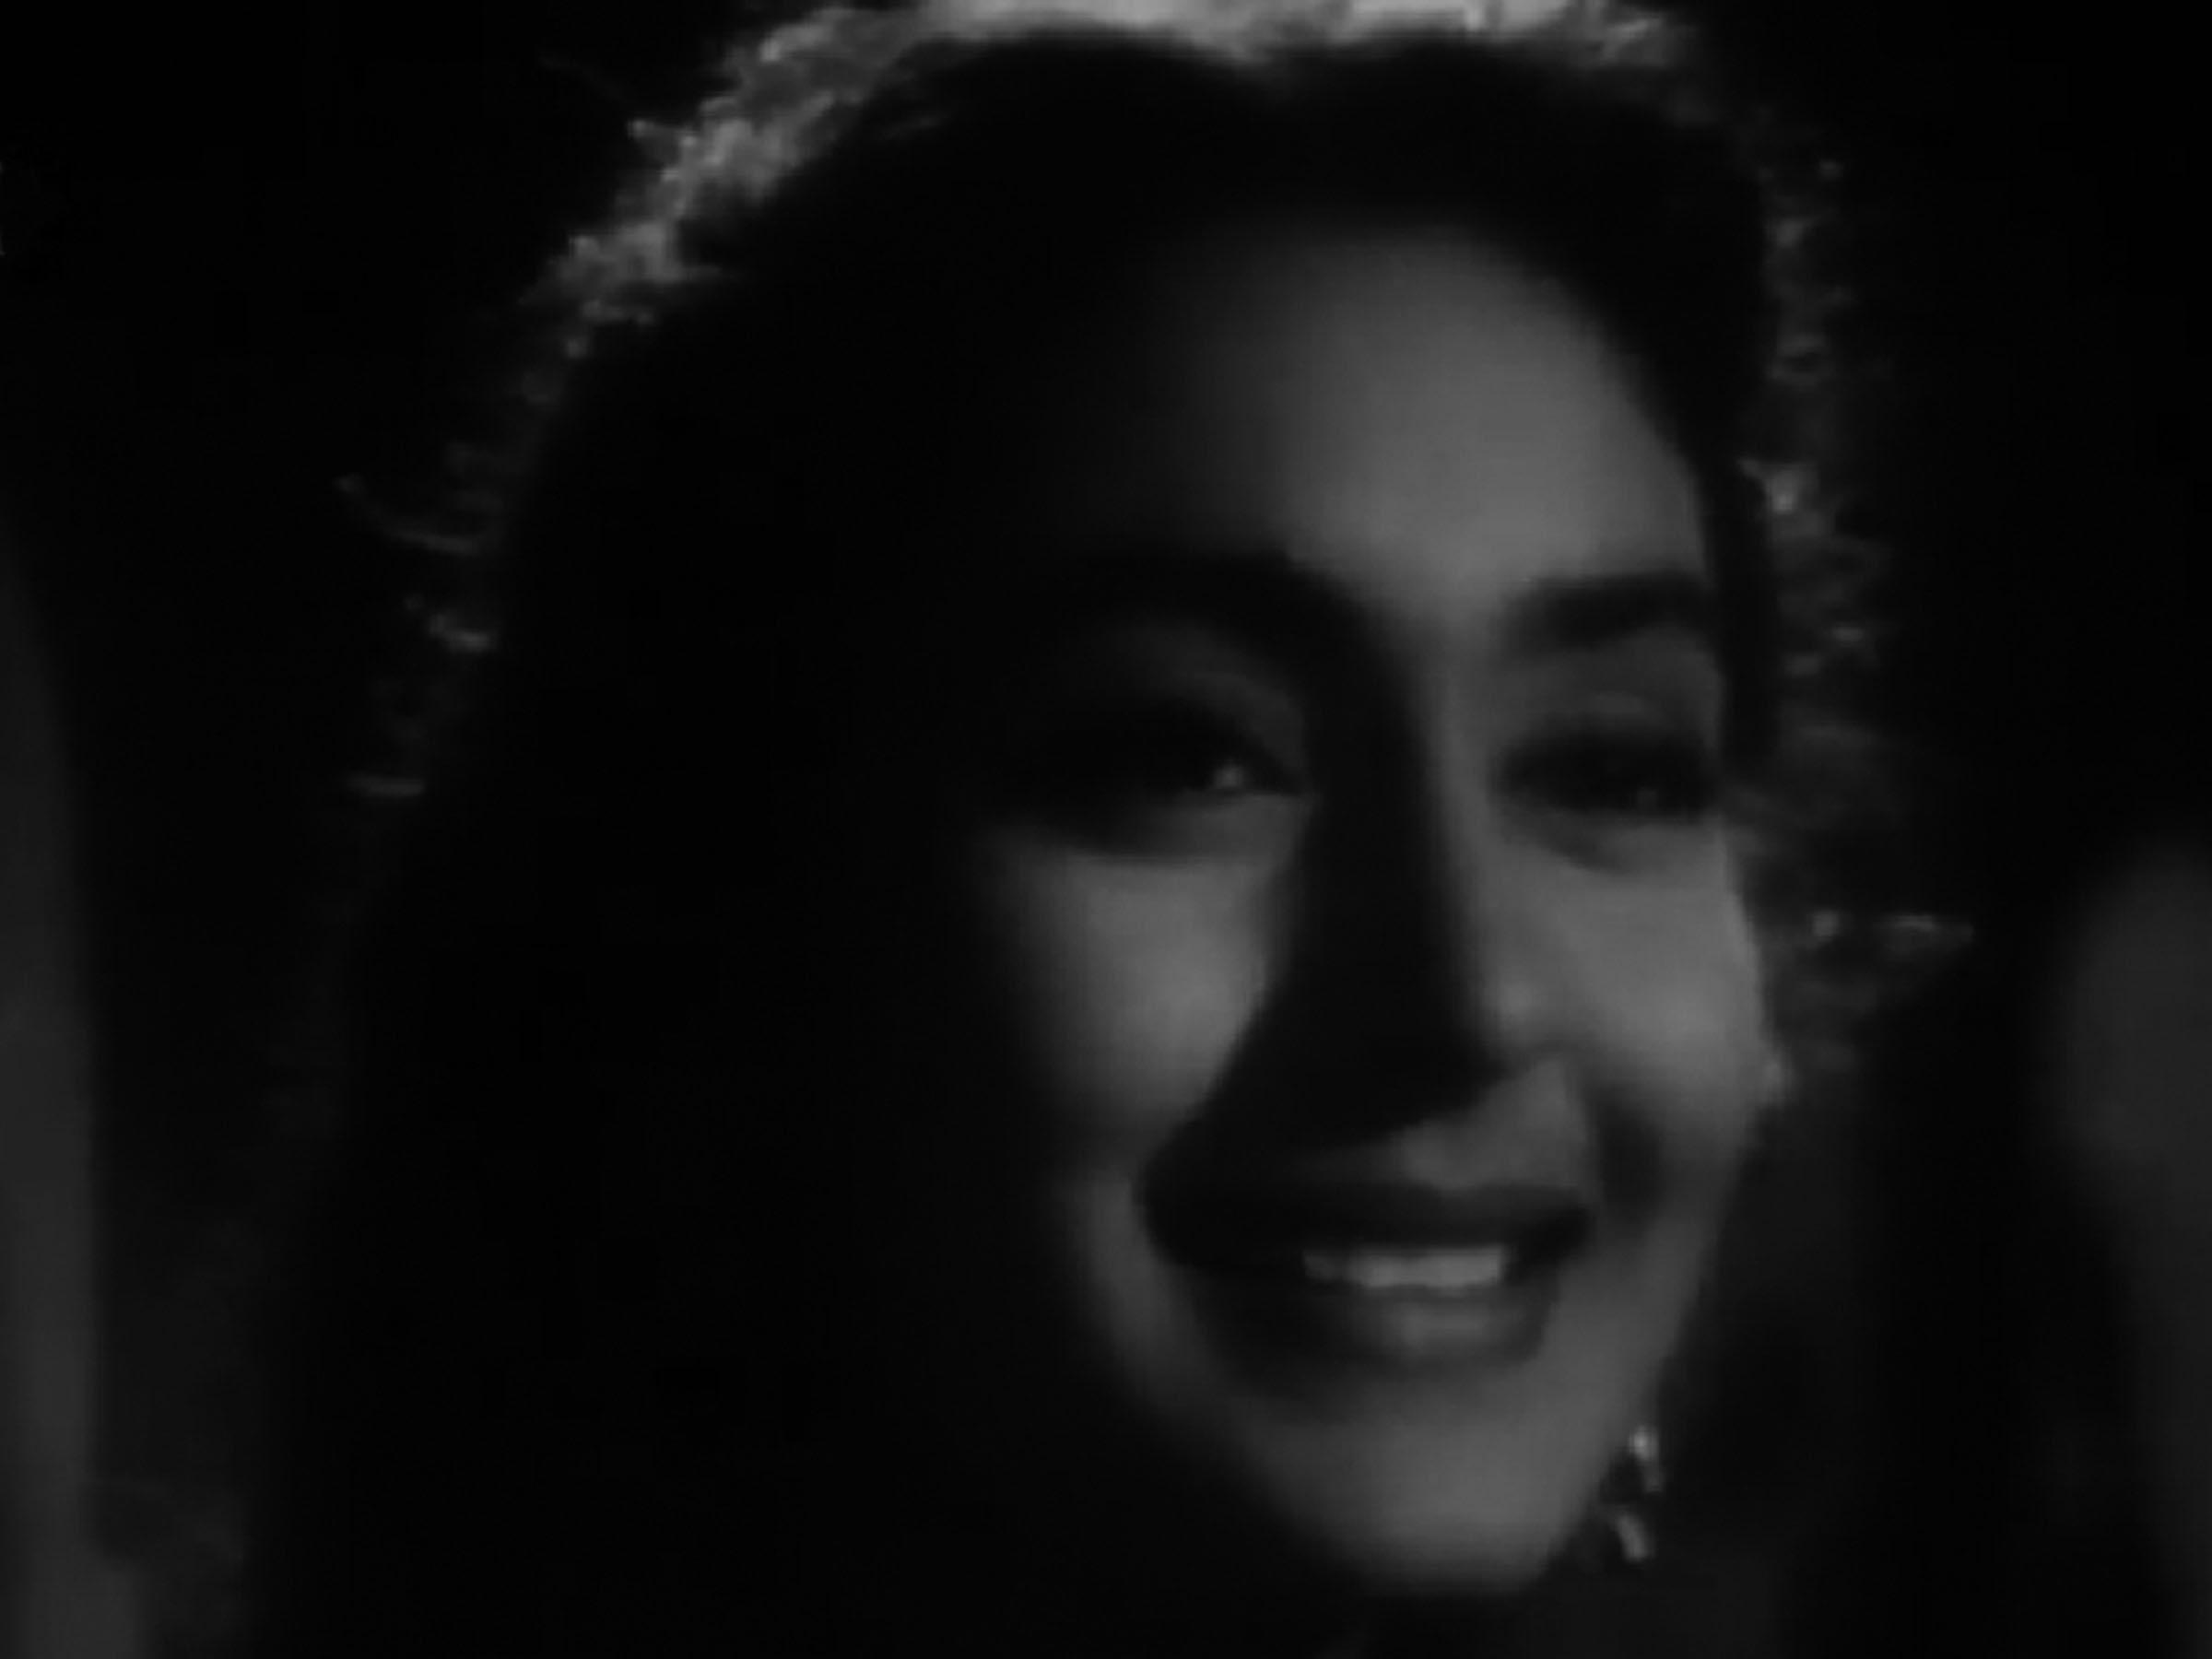 Naushad - Baiju Bawra